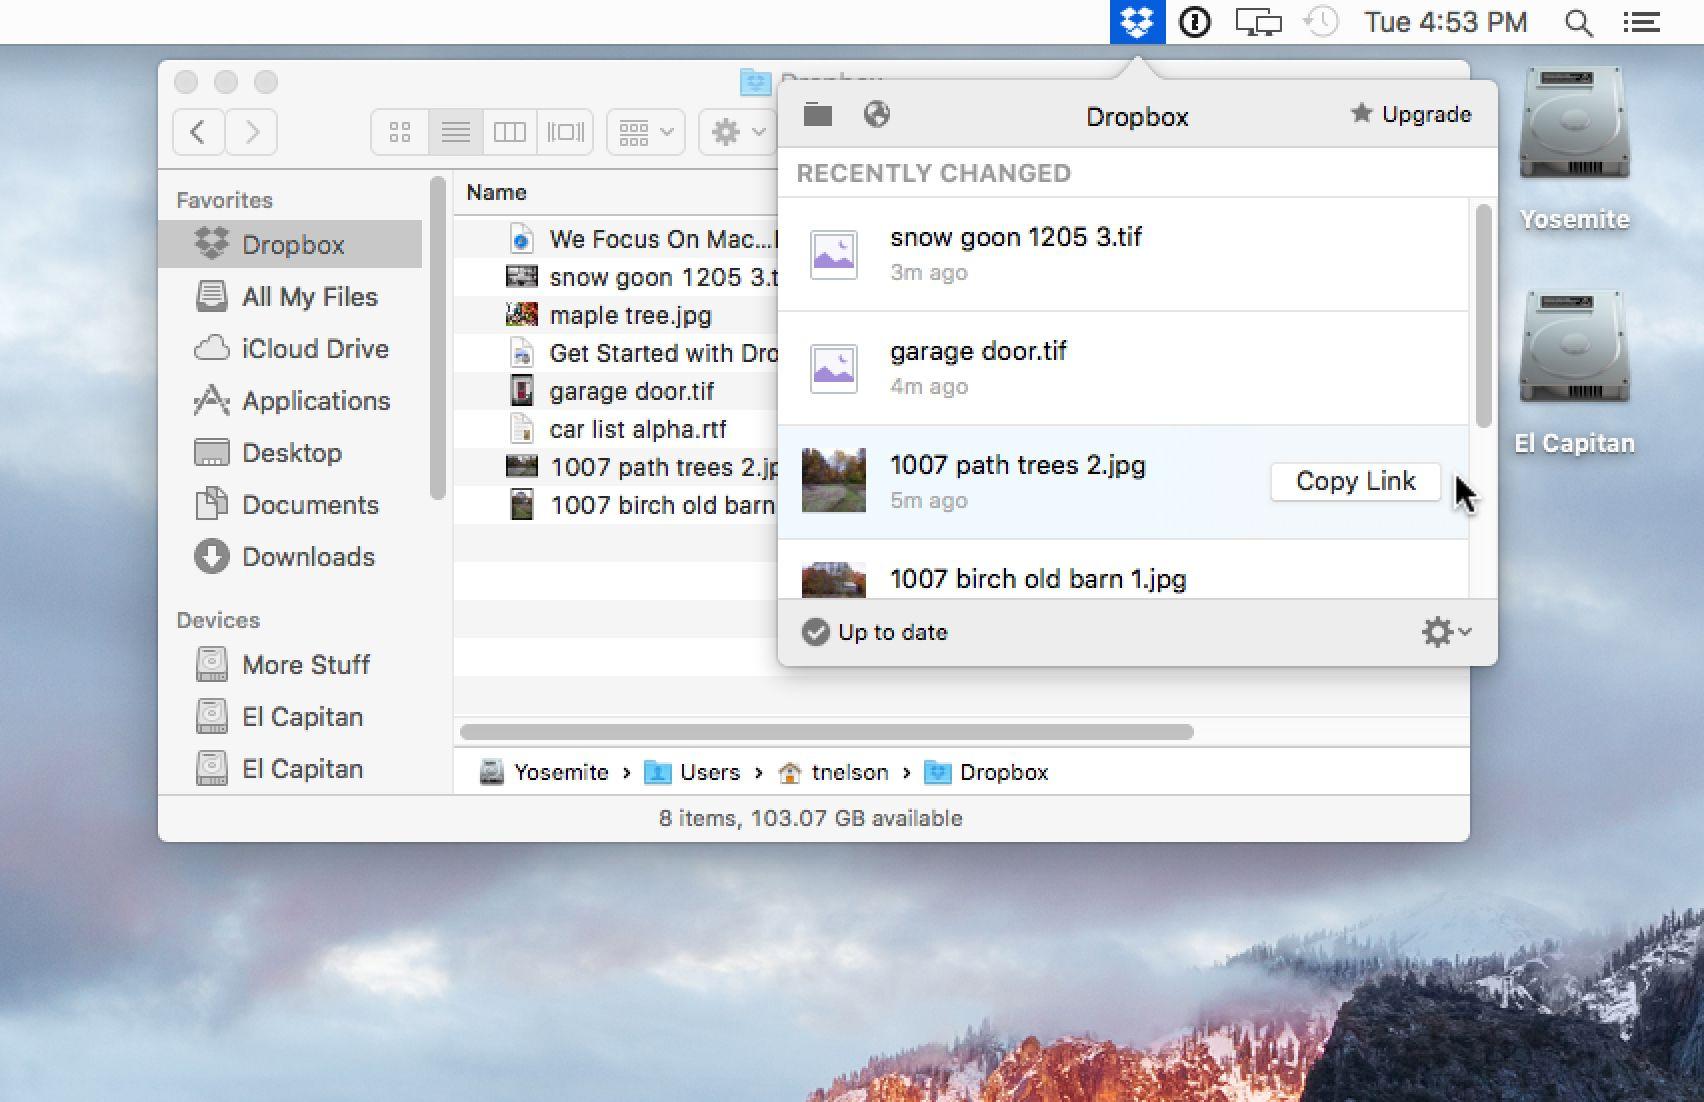 Dropbox For Mac Os X 10.5